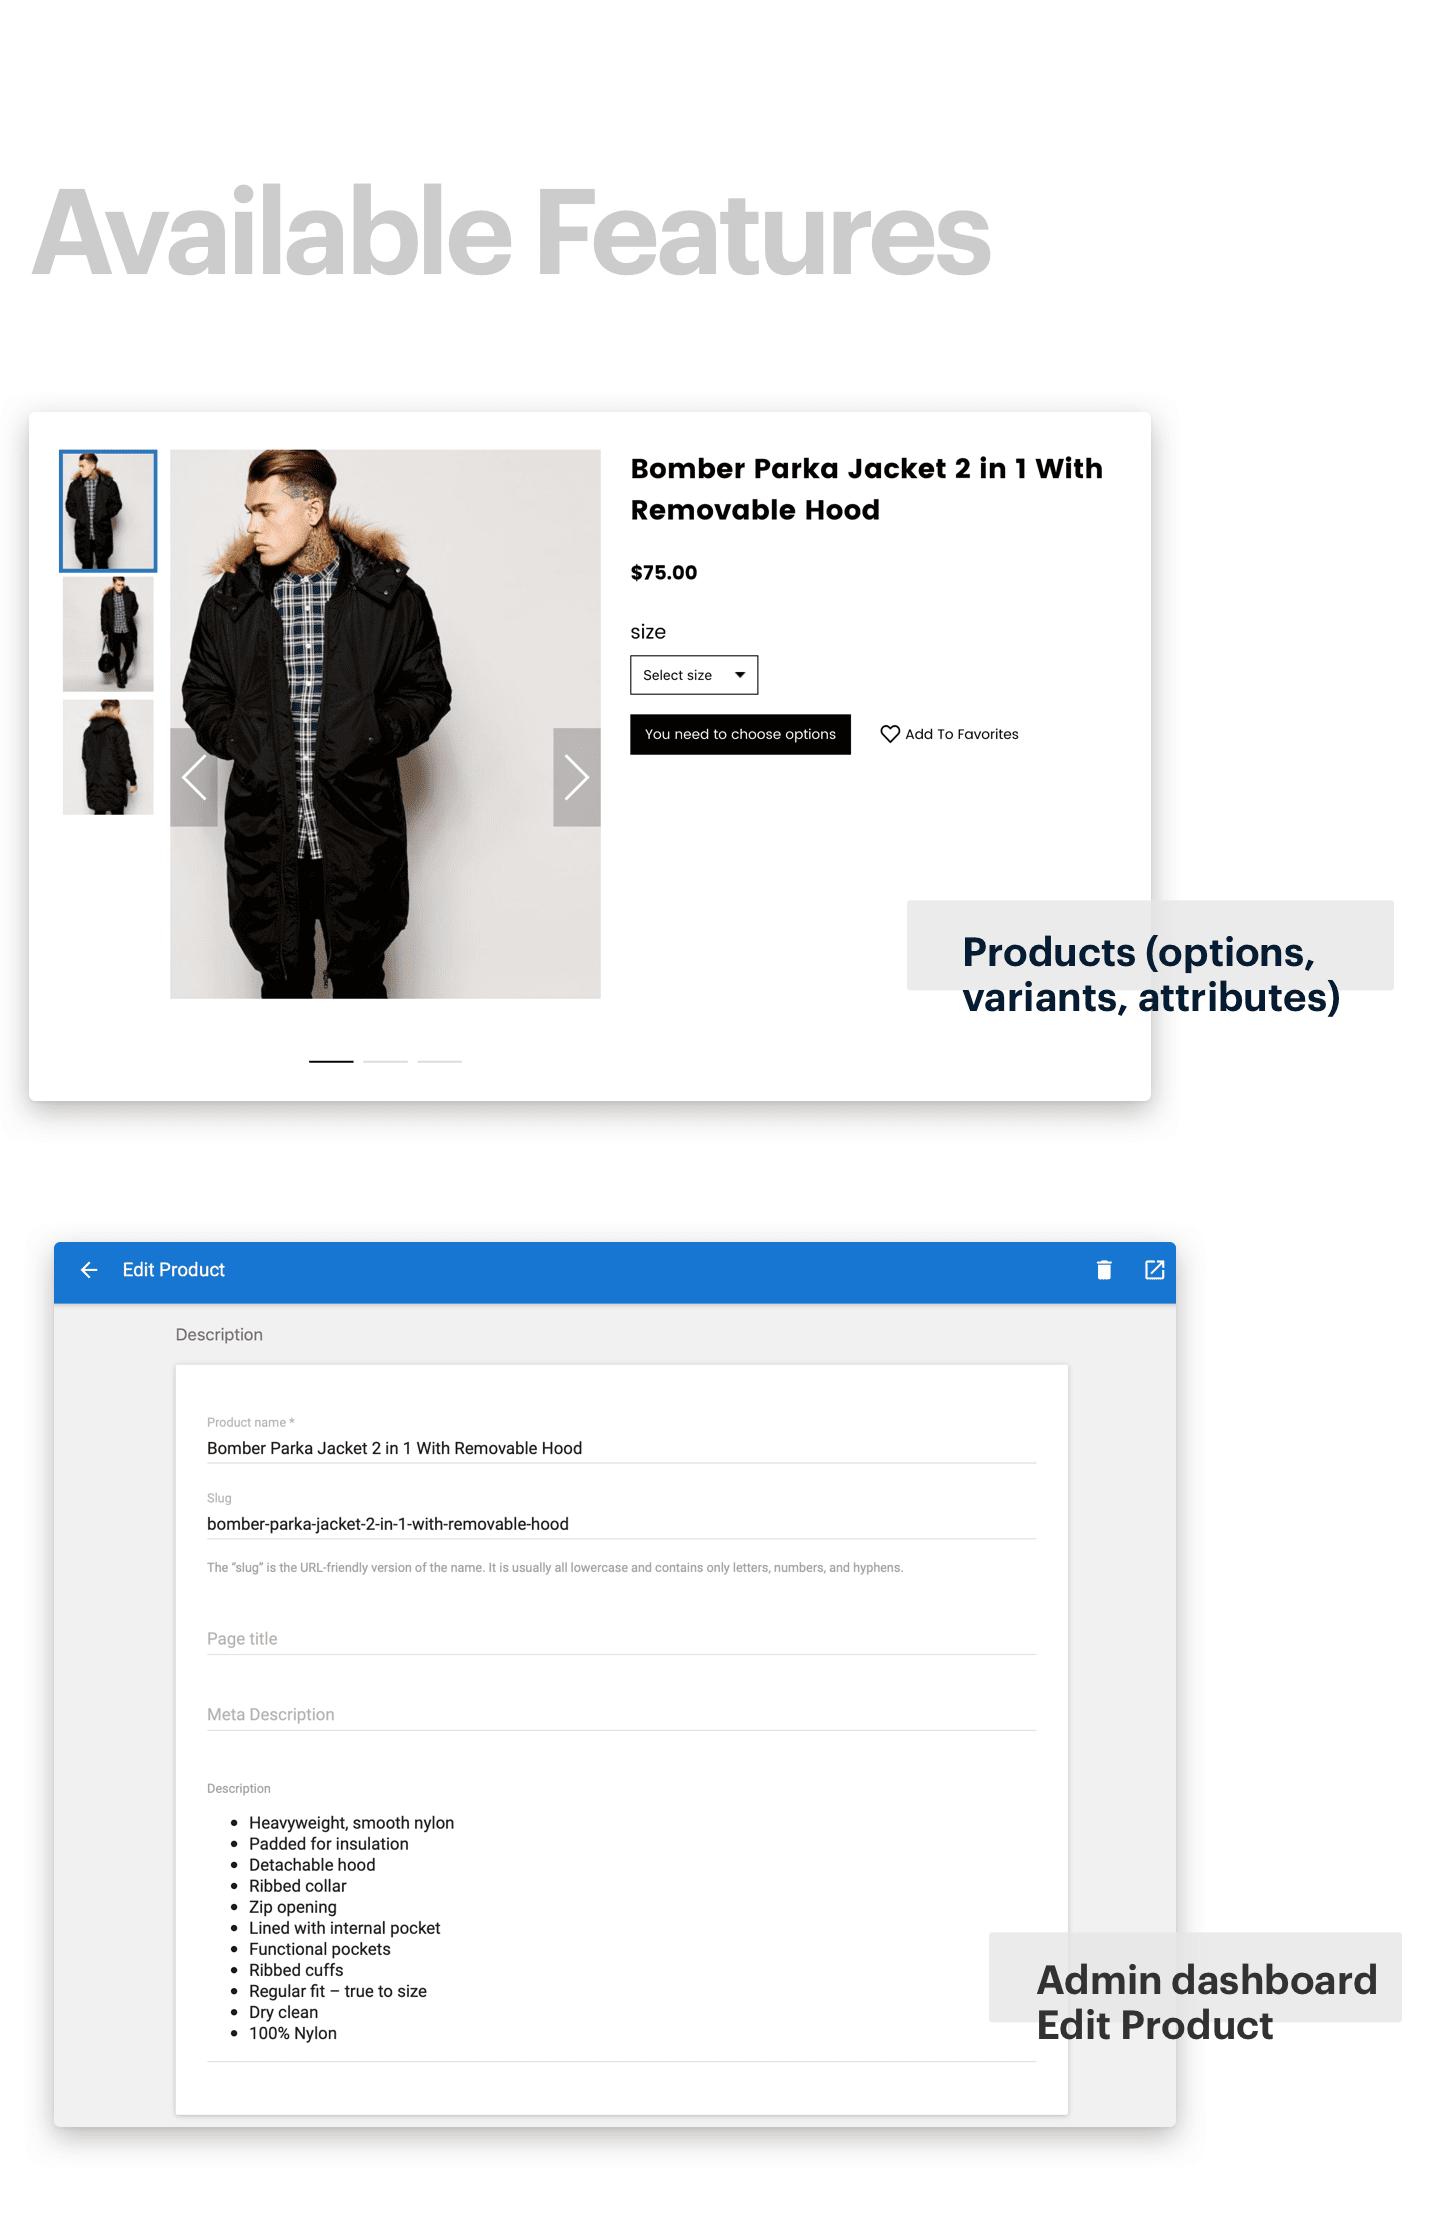 CeStore - ReactJS web app & React Native mobile app for e-commerce - 10